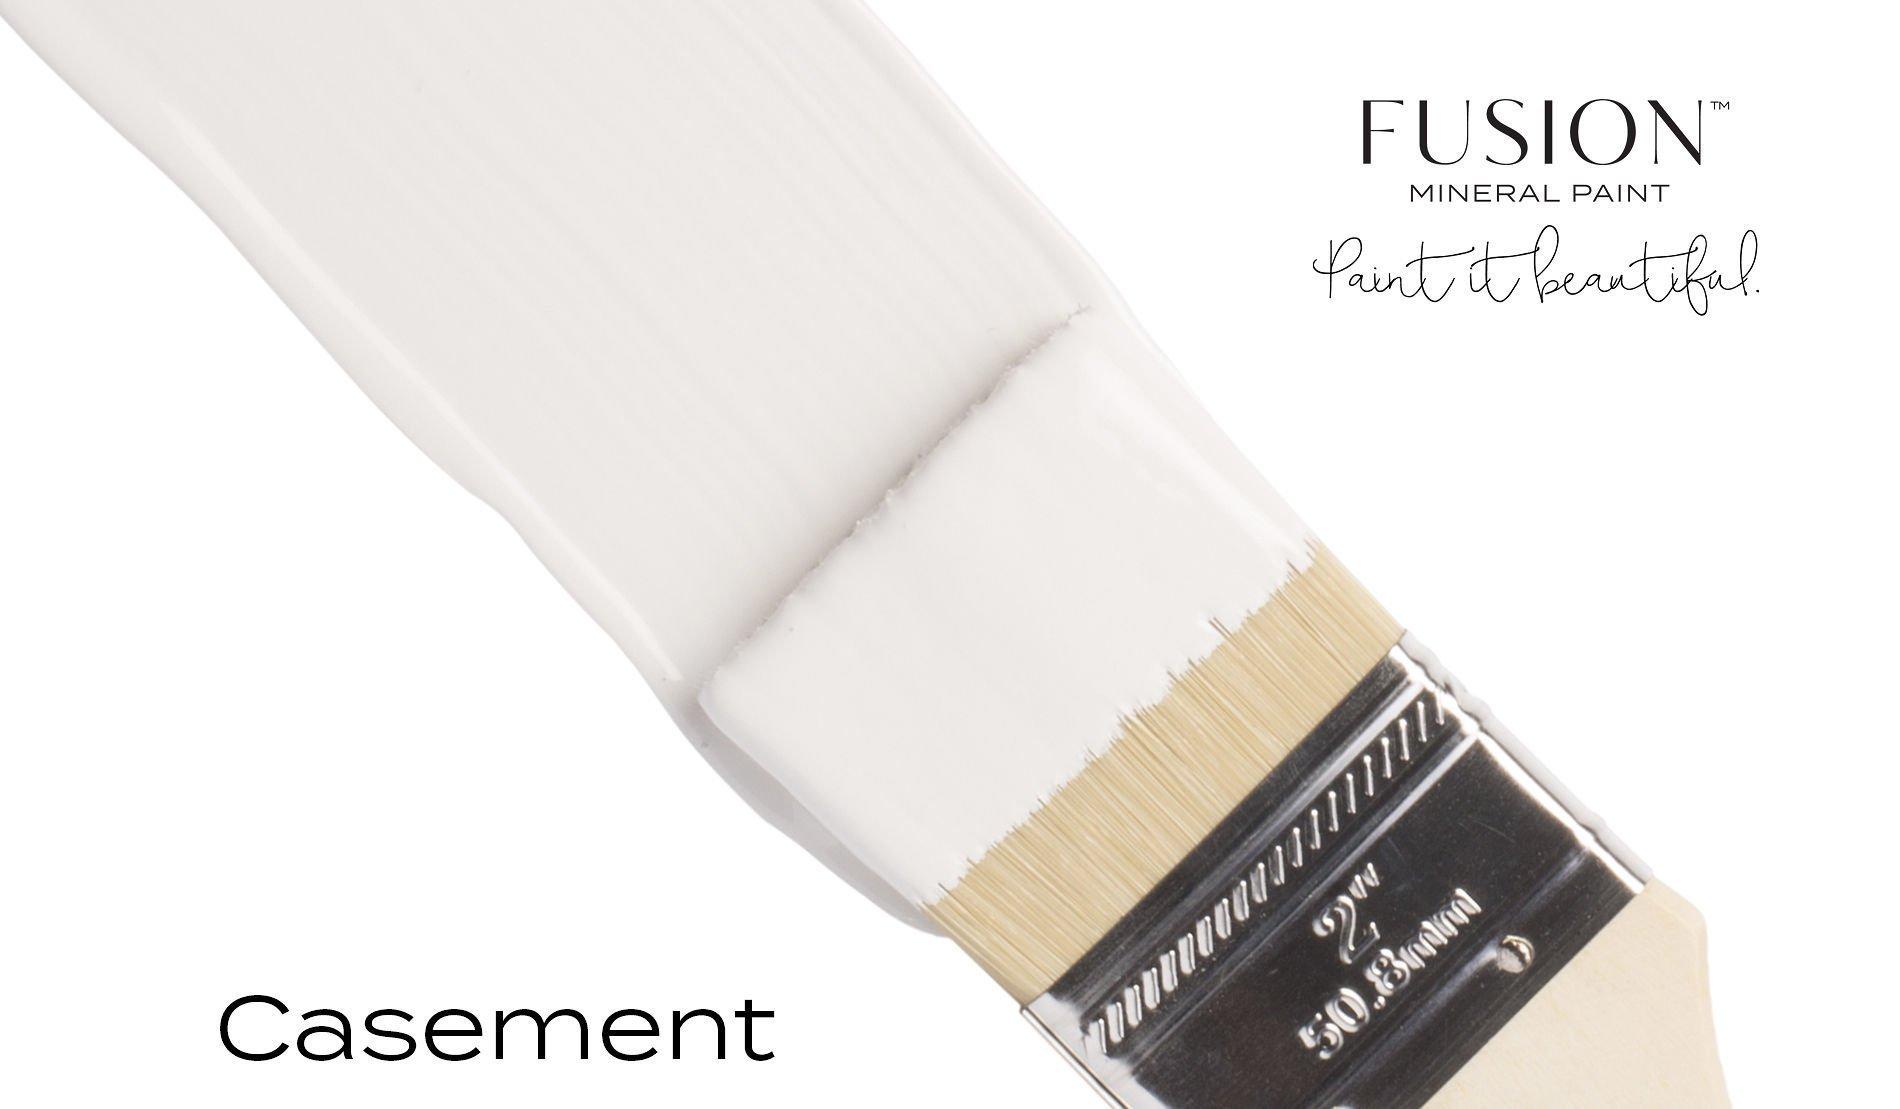 Fusion Mineral Paint Brushstroke - Casement | www.raggedy-bits.com